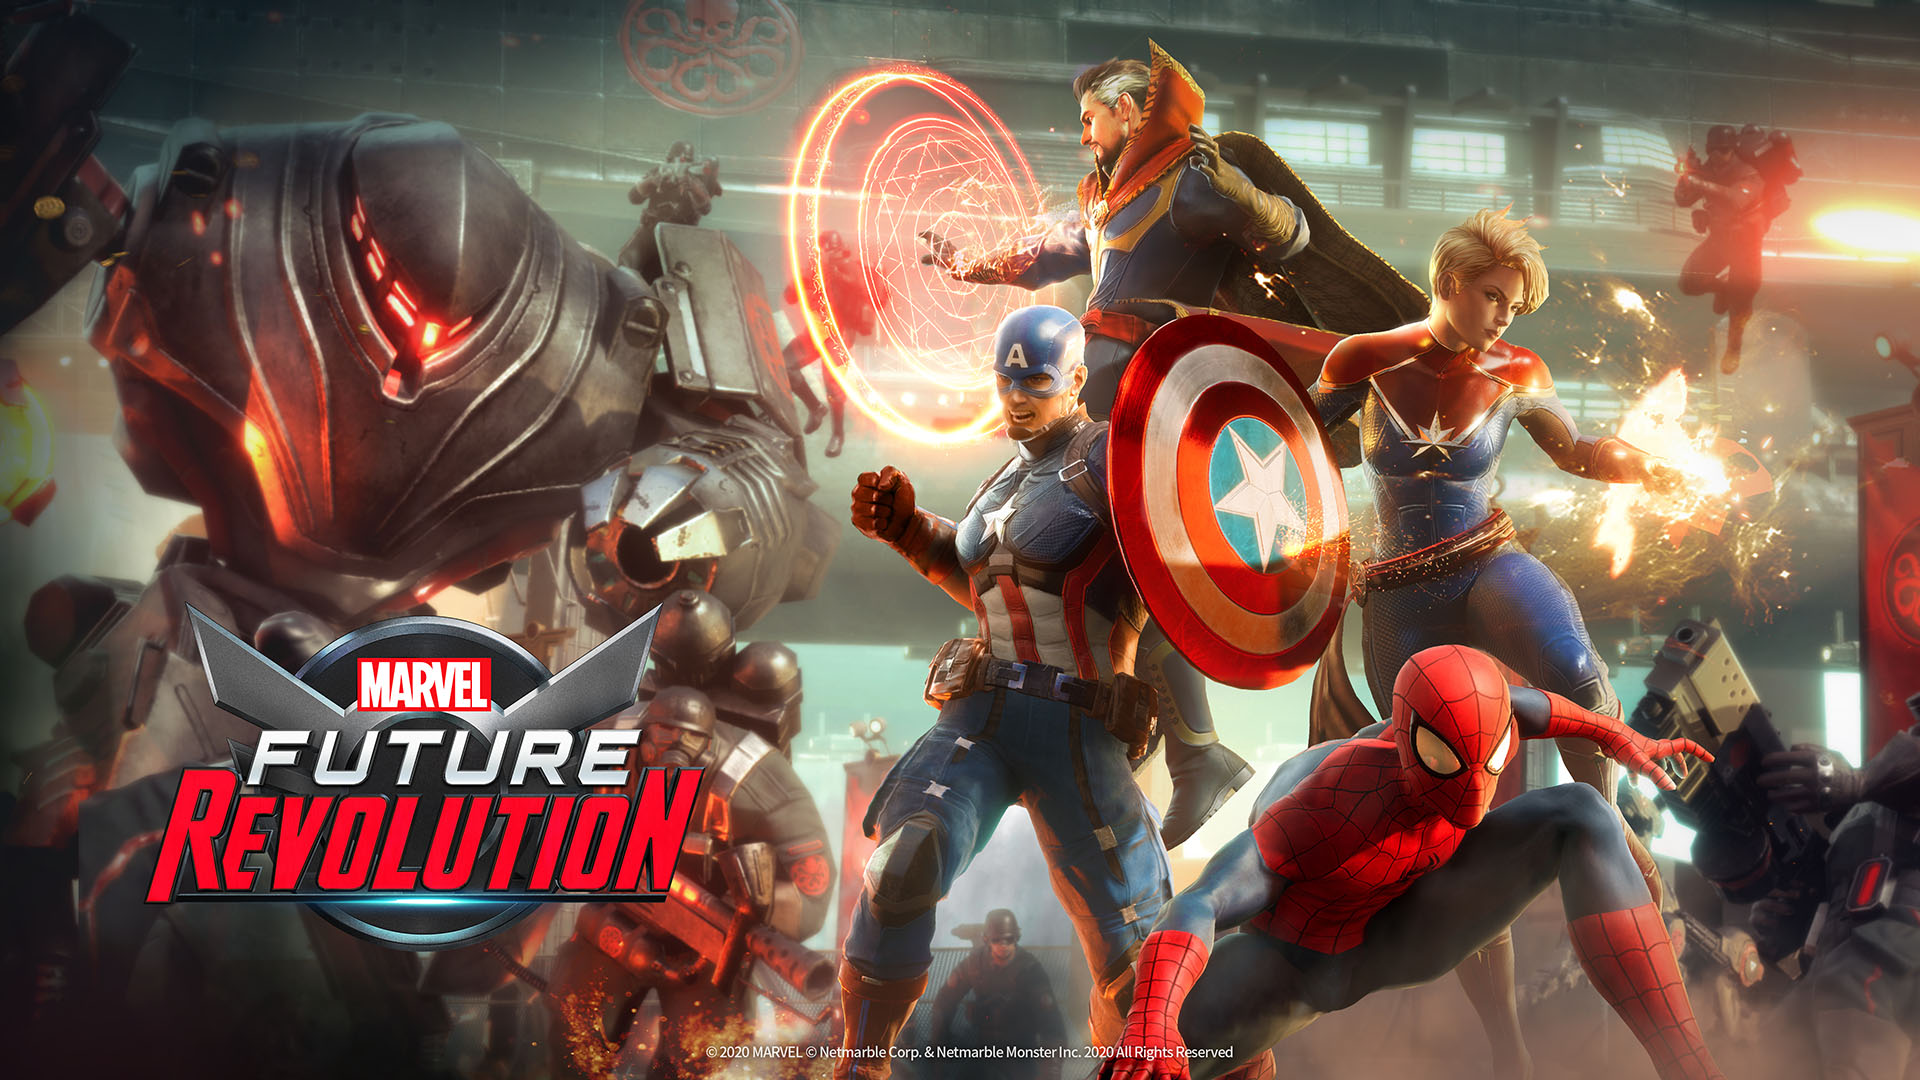 【Marvel Future Revolution】配信日・リリース日はいつ?事前登録情報